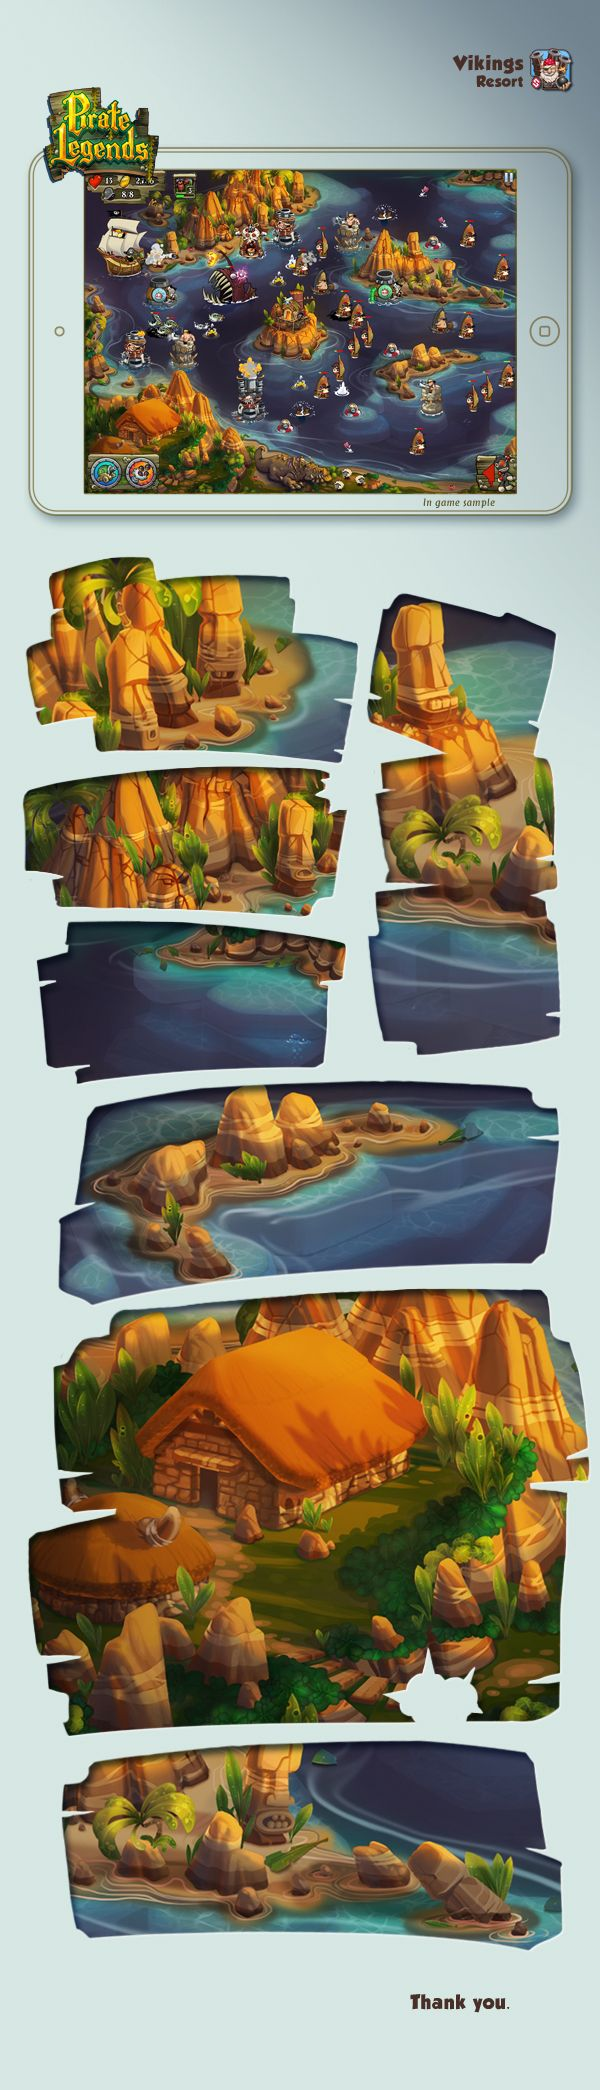 Pirate Legends TD Background 2 by Adrian Andreias, via Behance